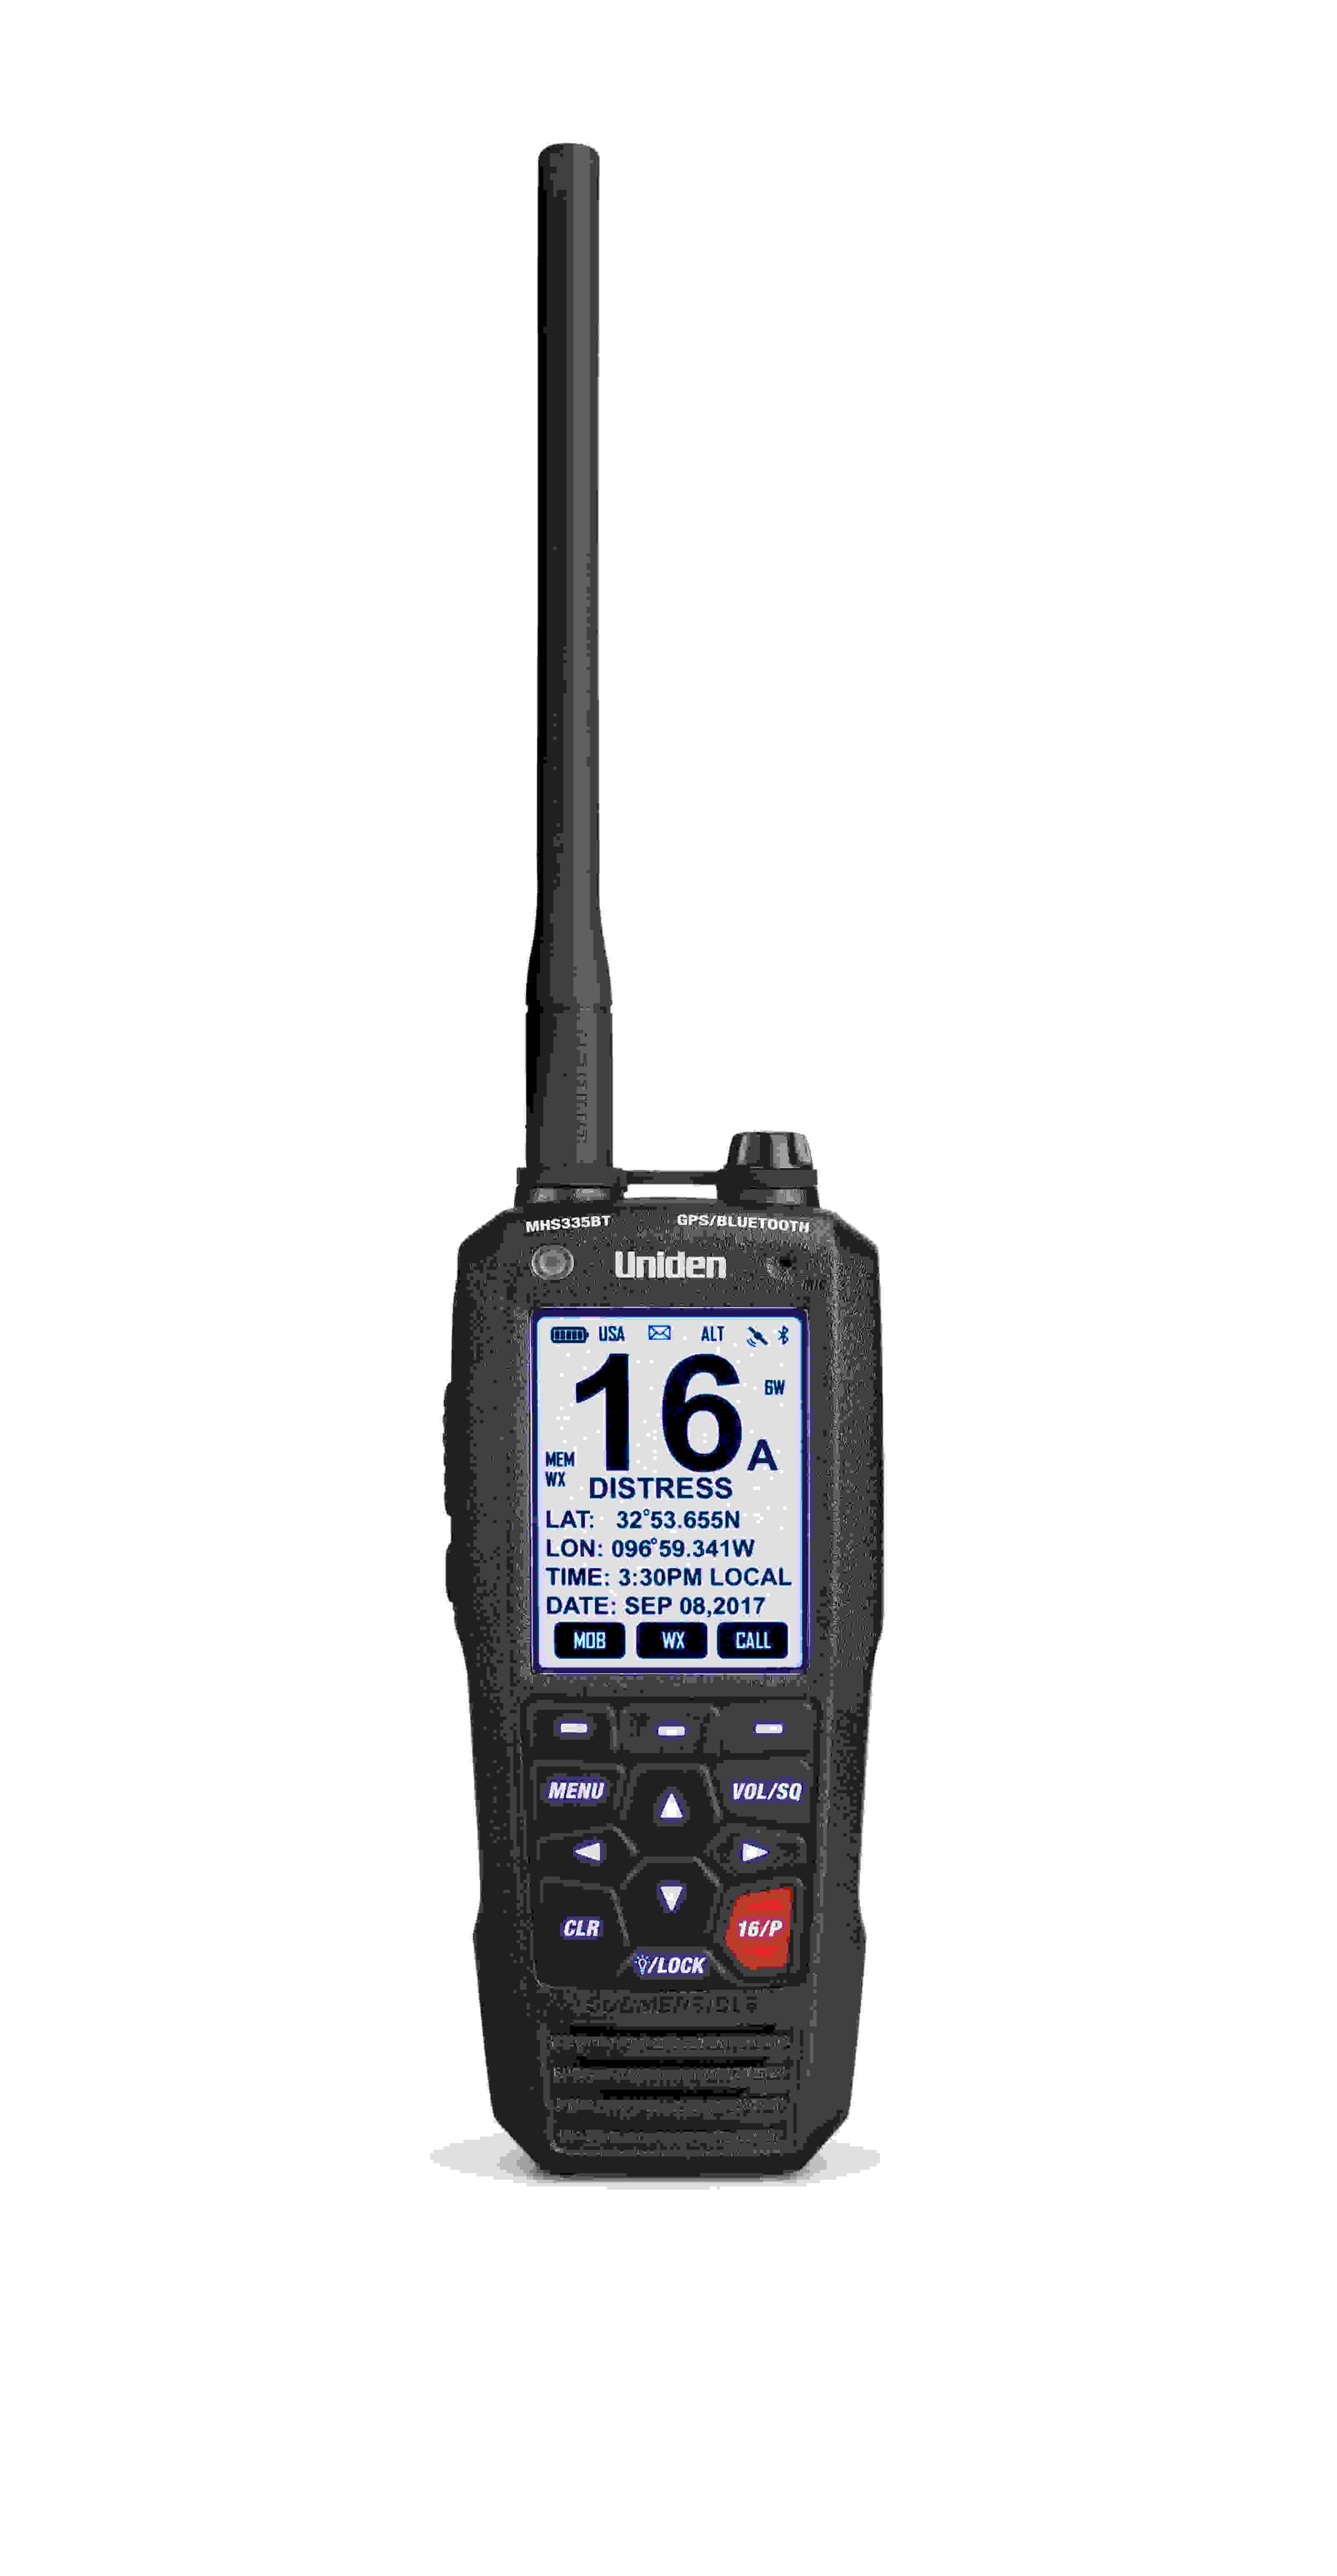 UNIDEN- MHS335BT 6 WATT CLASS D FLOATING HANDHELD VHF MARINE RADIO WITH BLUETOOTH & DISTRESS CALL